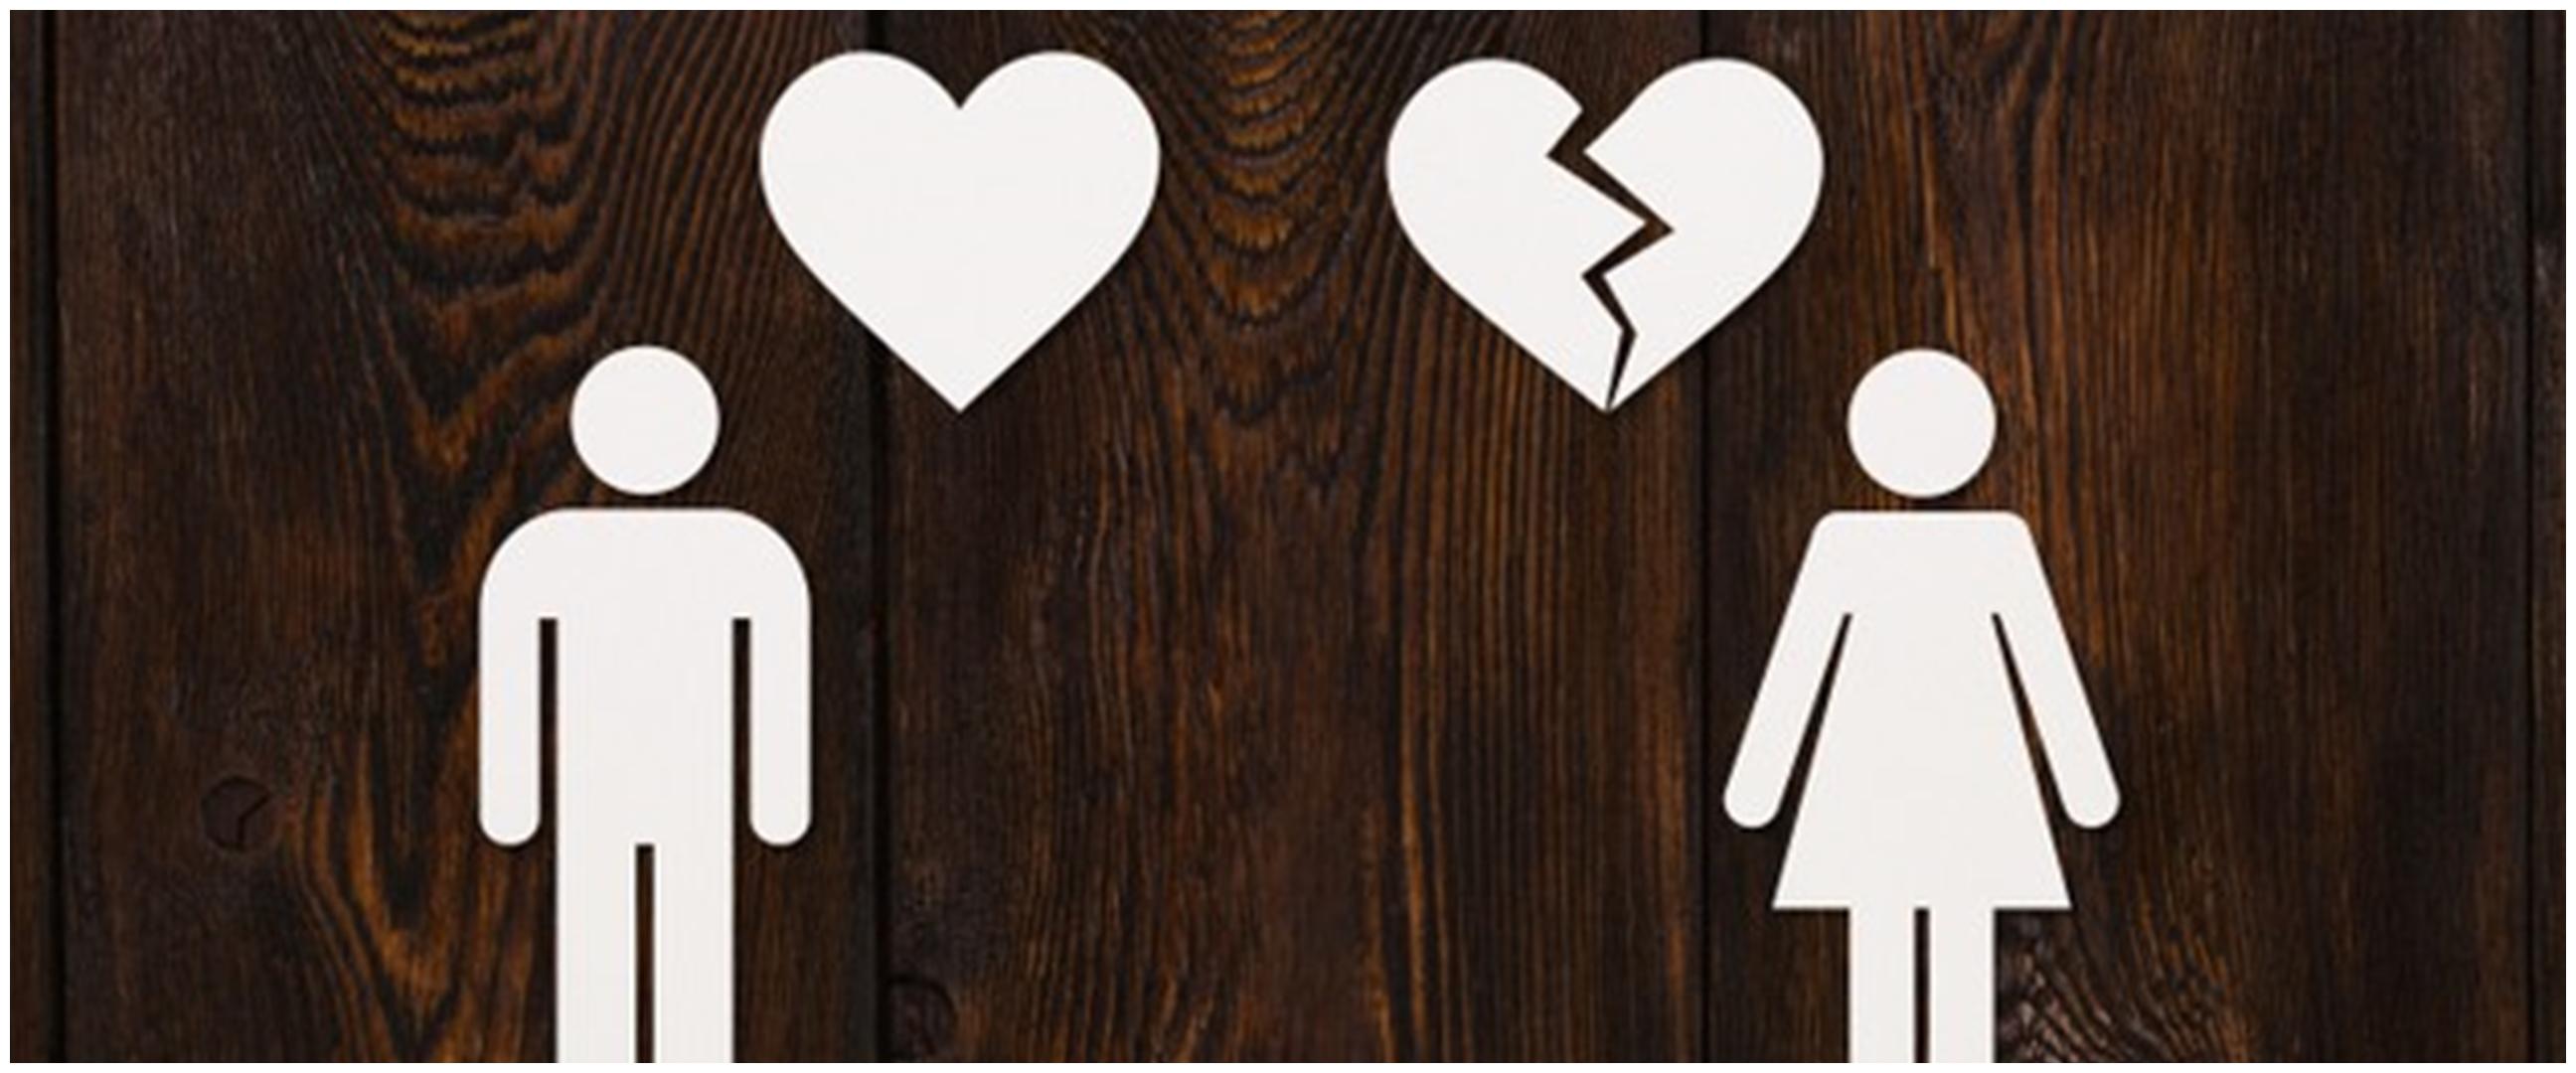 40 Kata-kata bijak cinta bertepuk sebelah tangan, bikin hati tegar